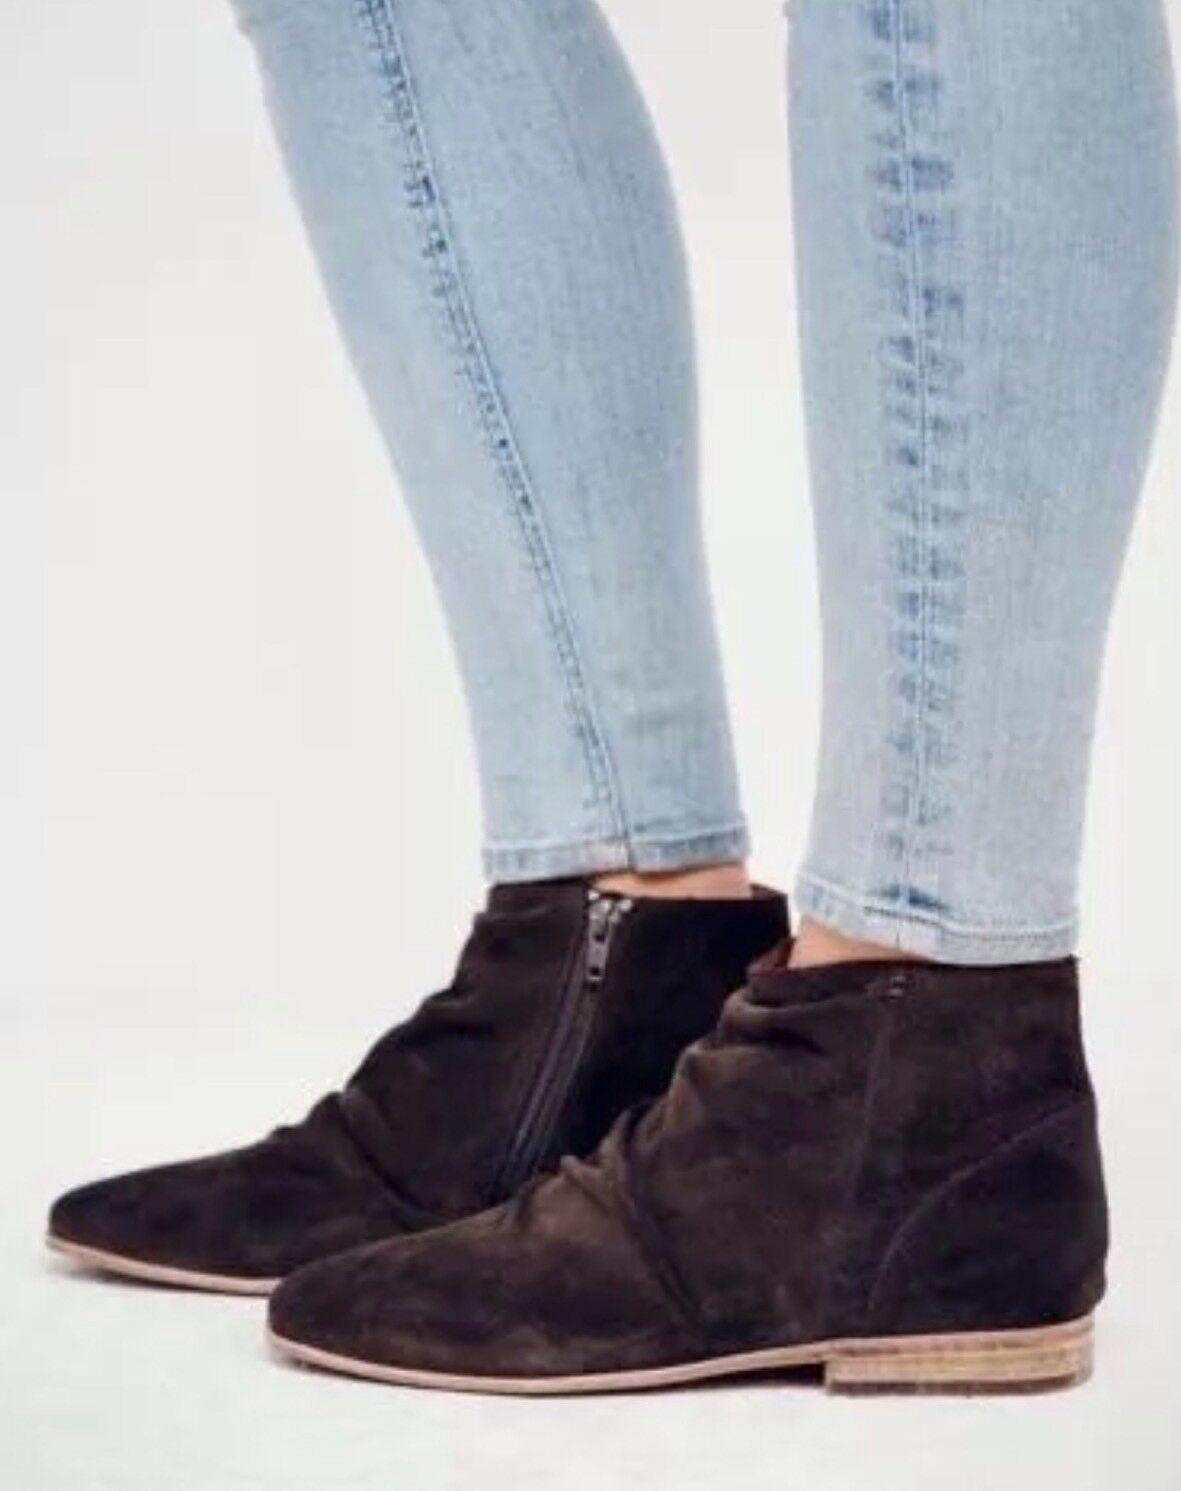 Jeffrey Campbell Khaki Oiled Speir Ankle Boots Slouchy Zipper Booties Sz 10 198